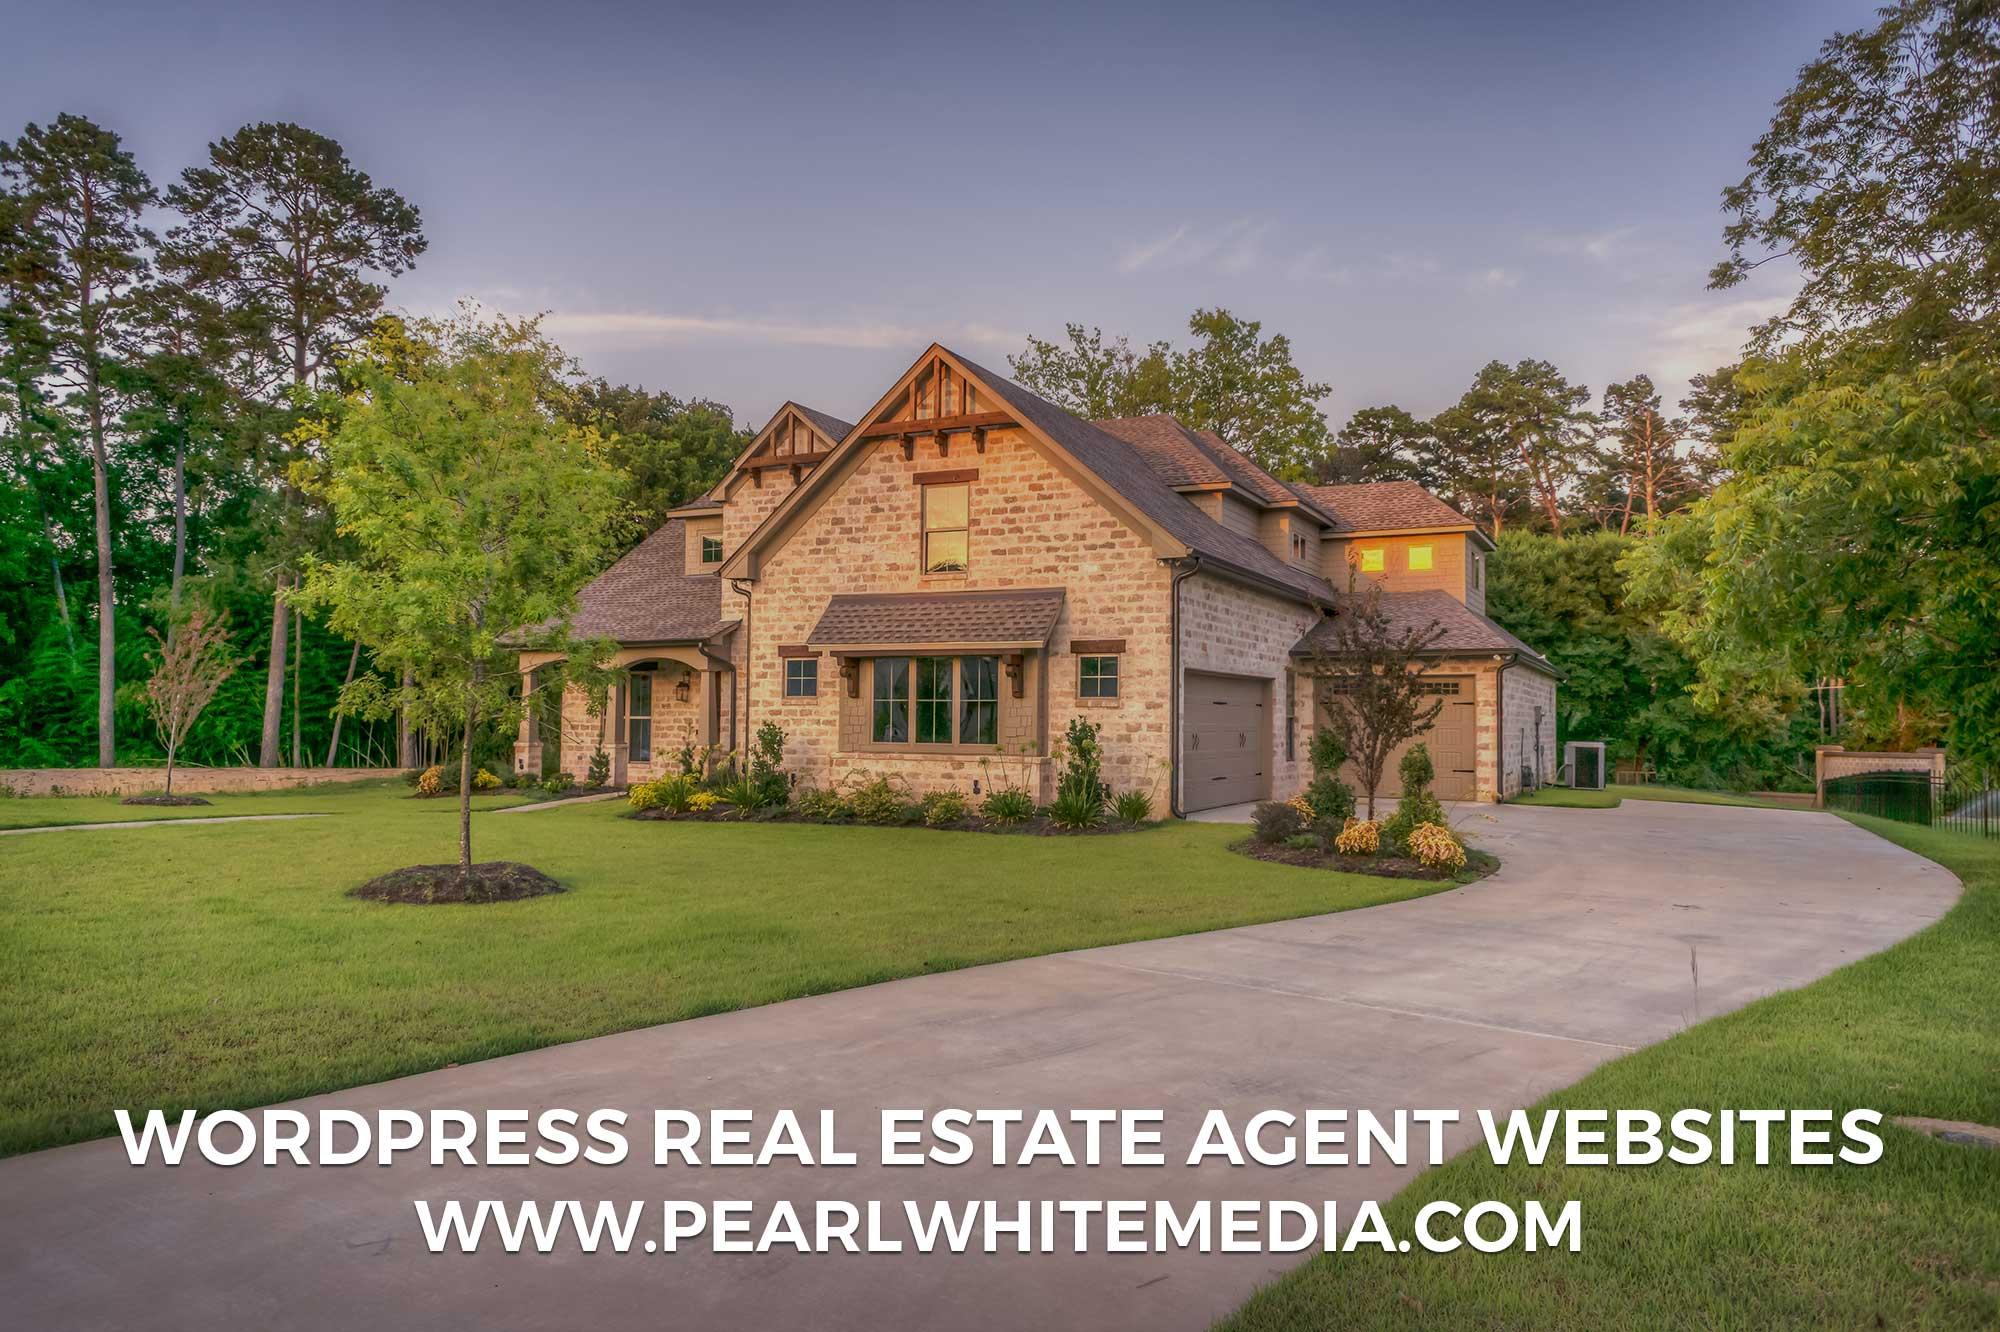 Wordpress real estate agent websites